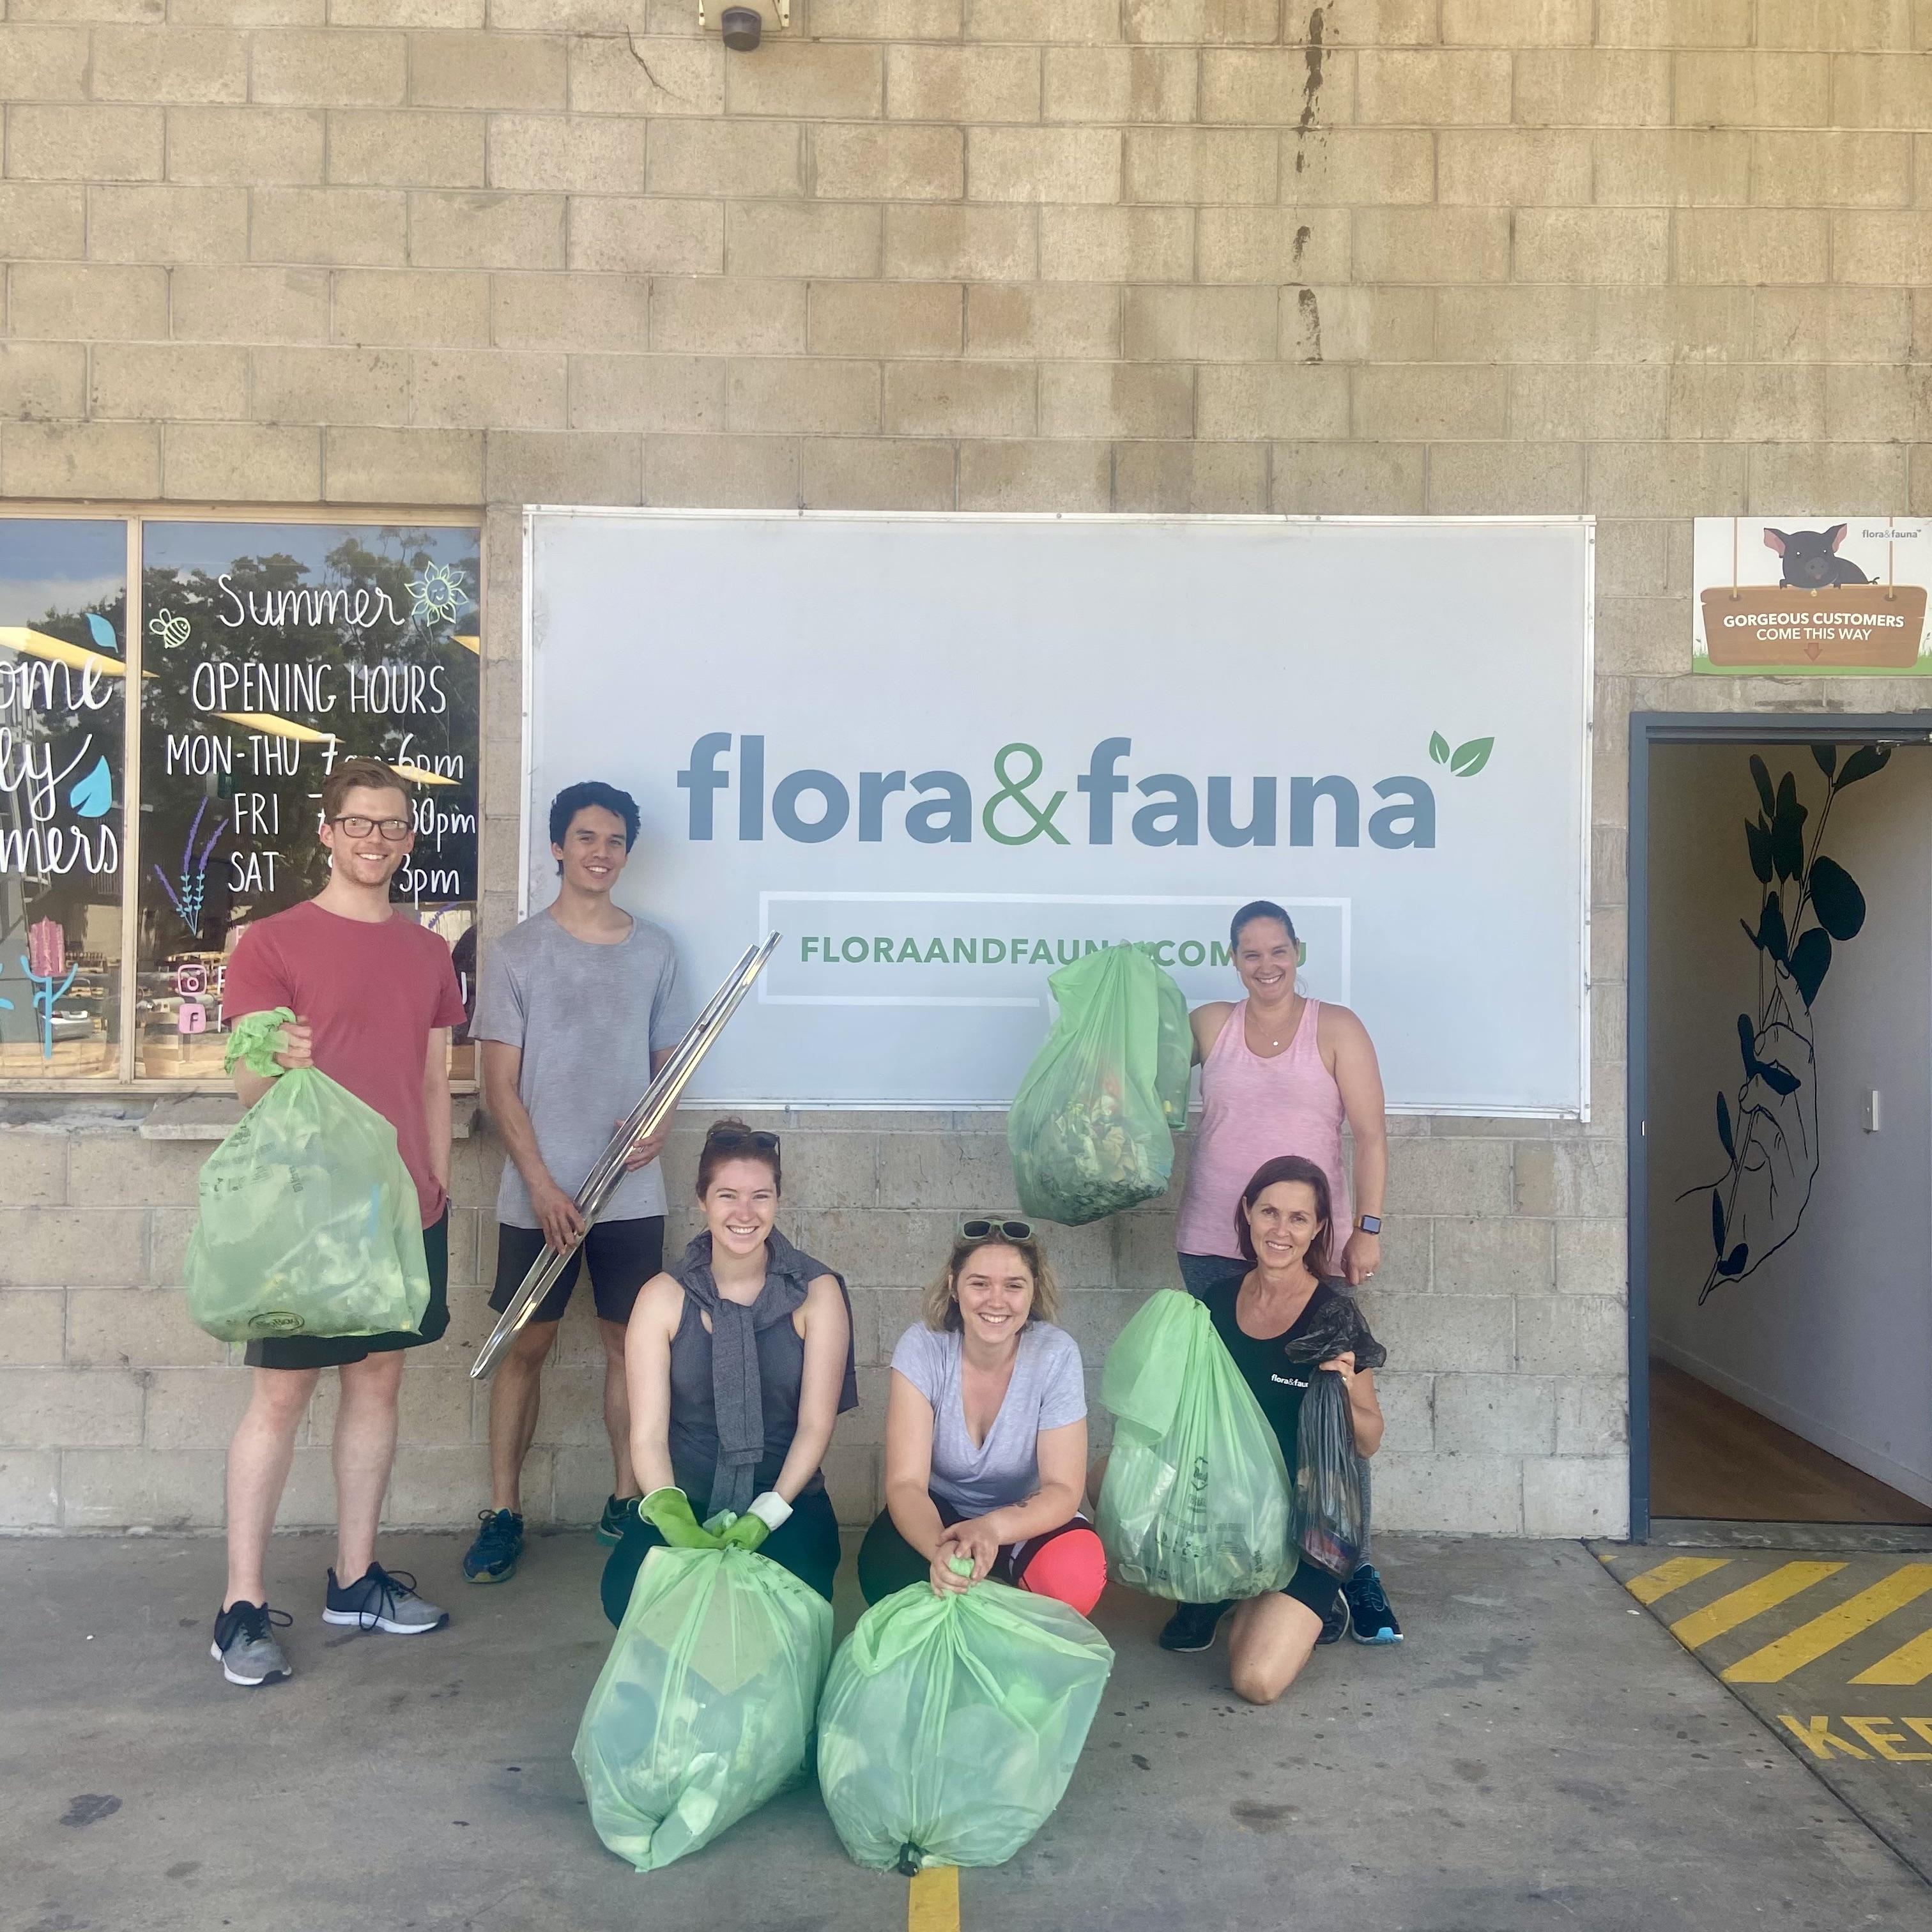 Business Clean Up Day - Flora & Fauna Team